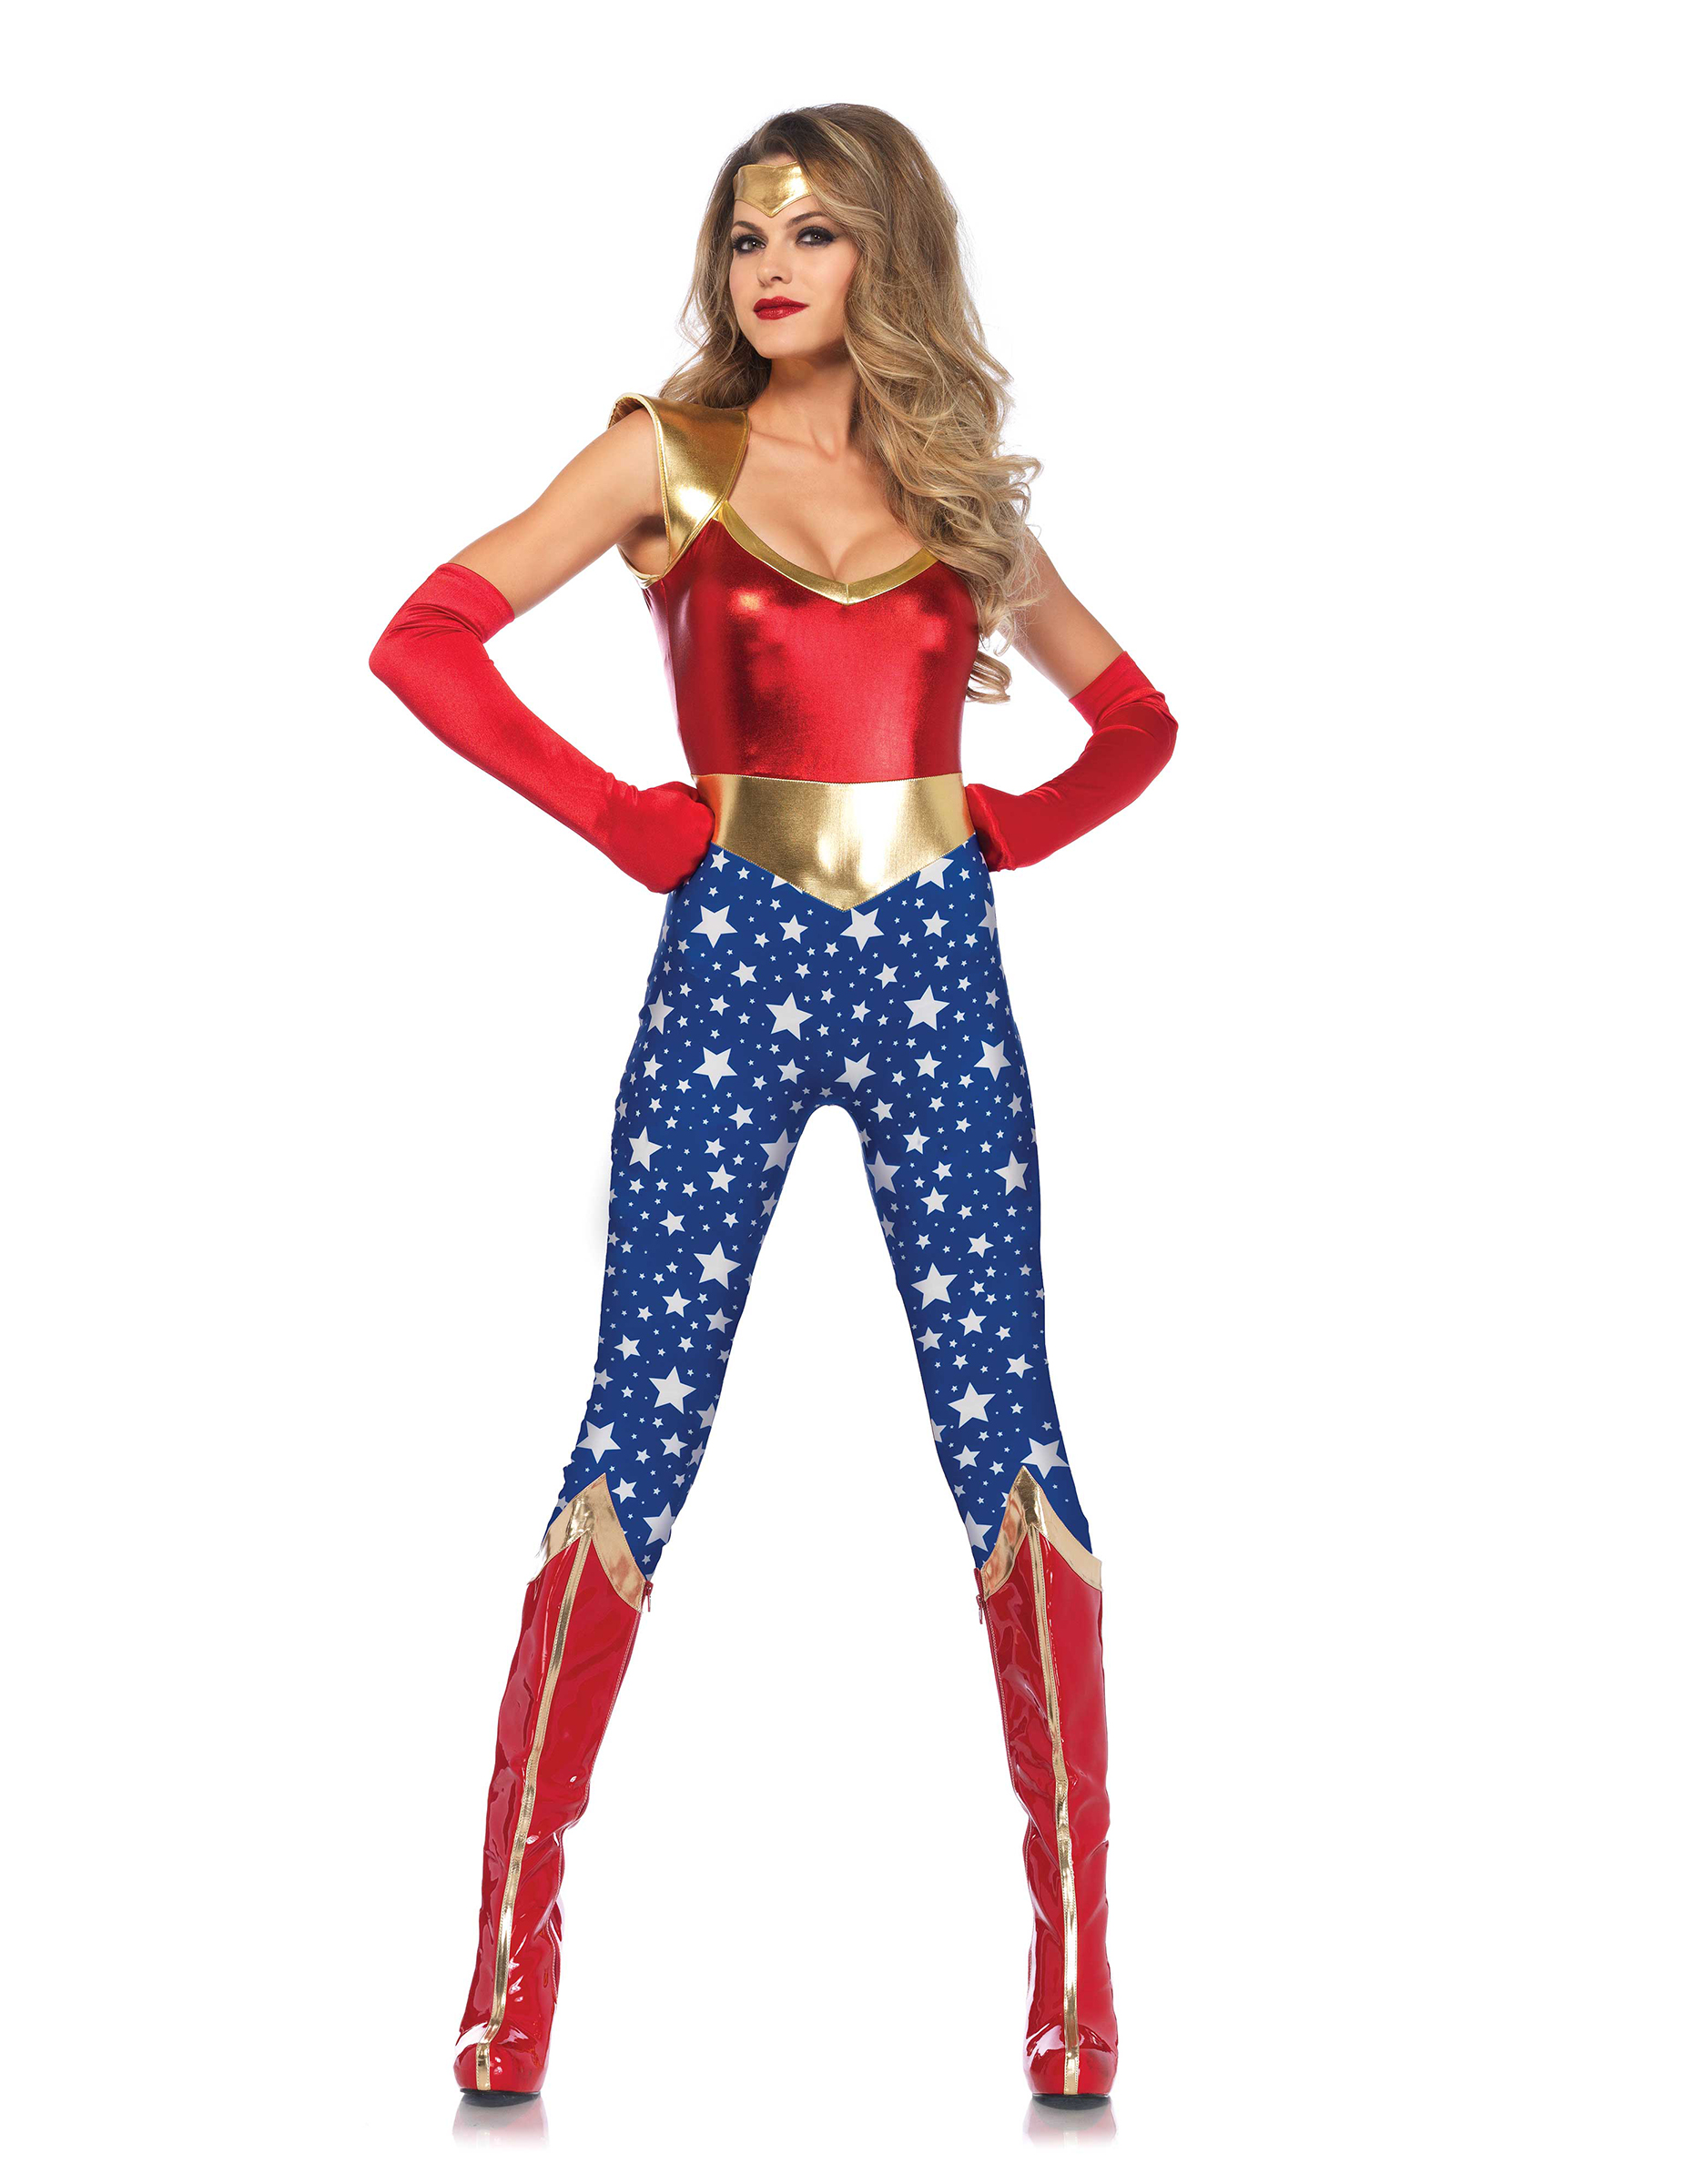 Bien connu Deguisement super hero femme deguisement zorro enfant | Blog  AB65